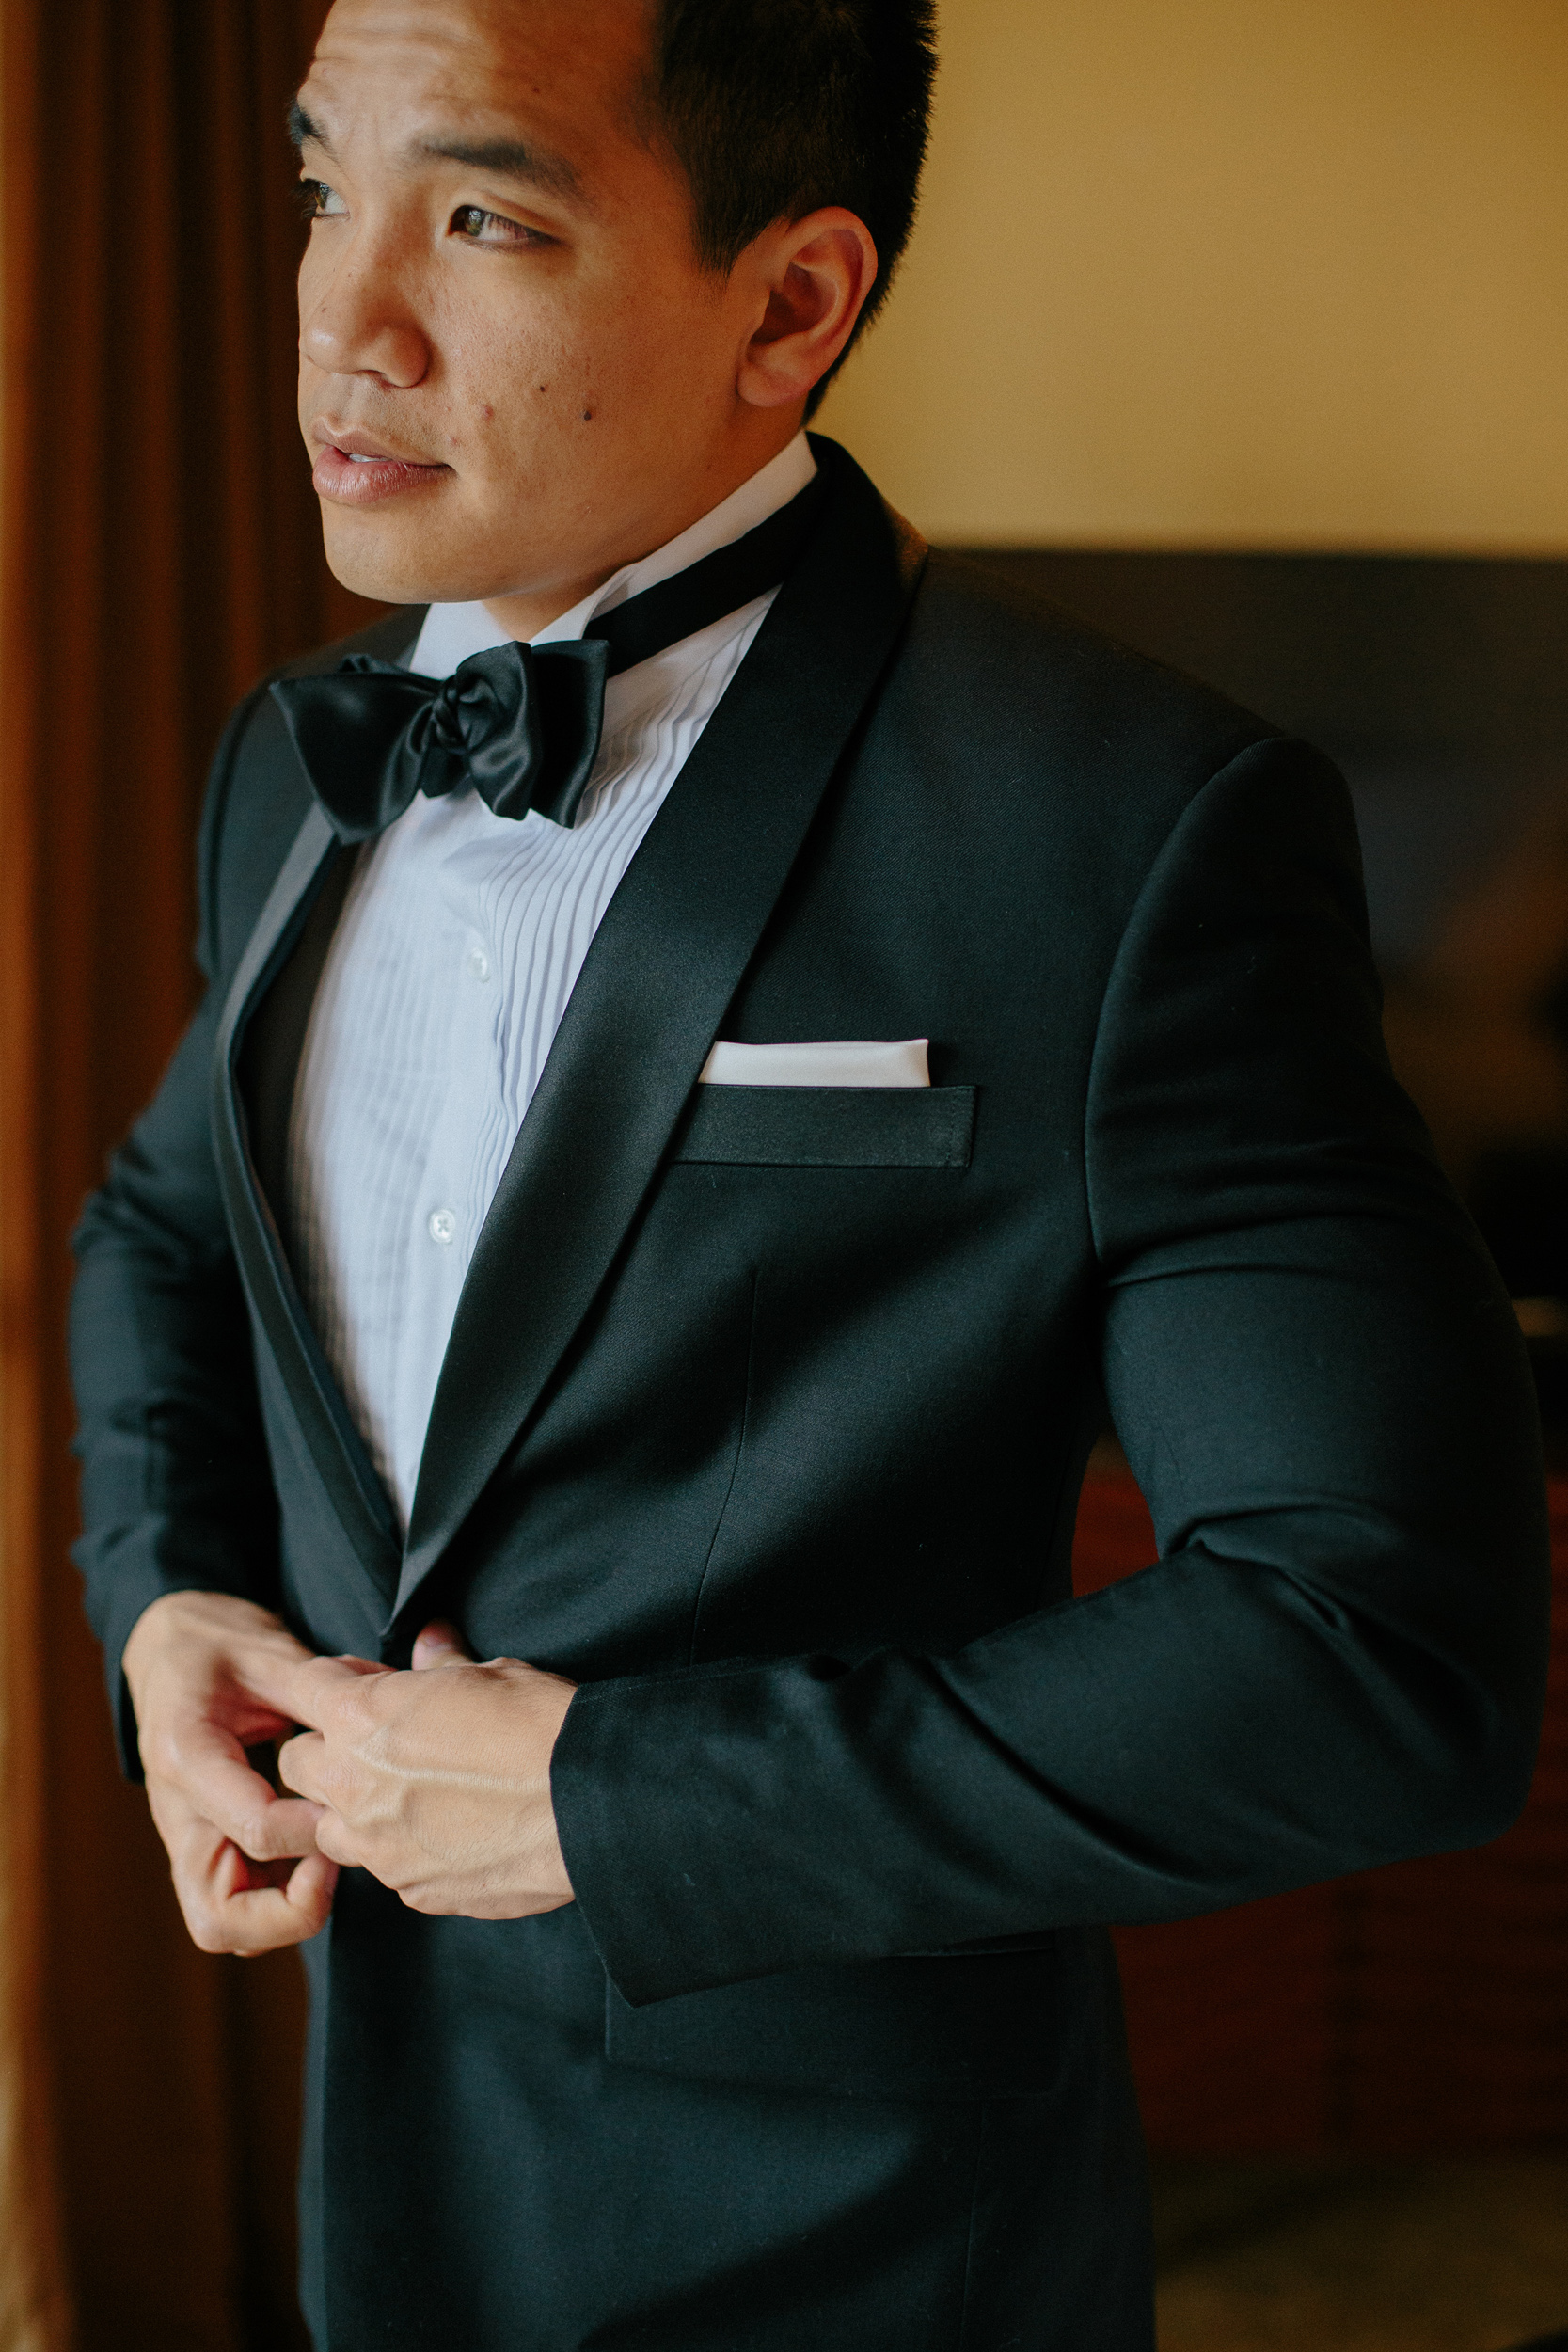 singapore-wedding-photographer-cheryl-matthew-fullerton-hotel-wedding-35.jpg